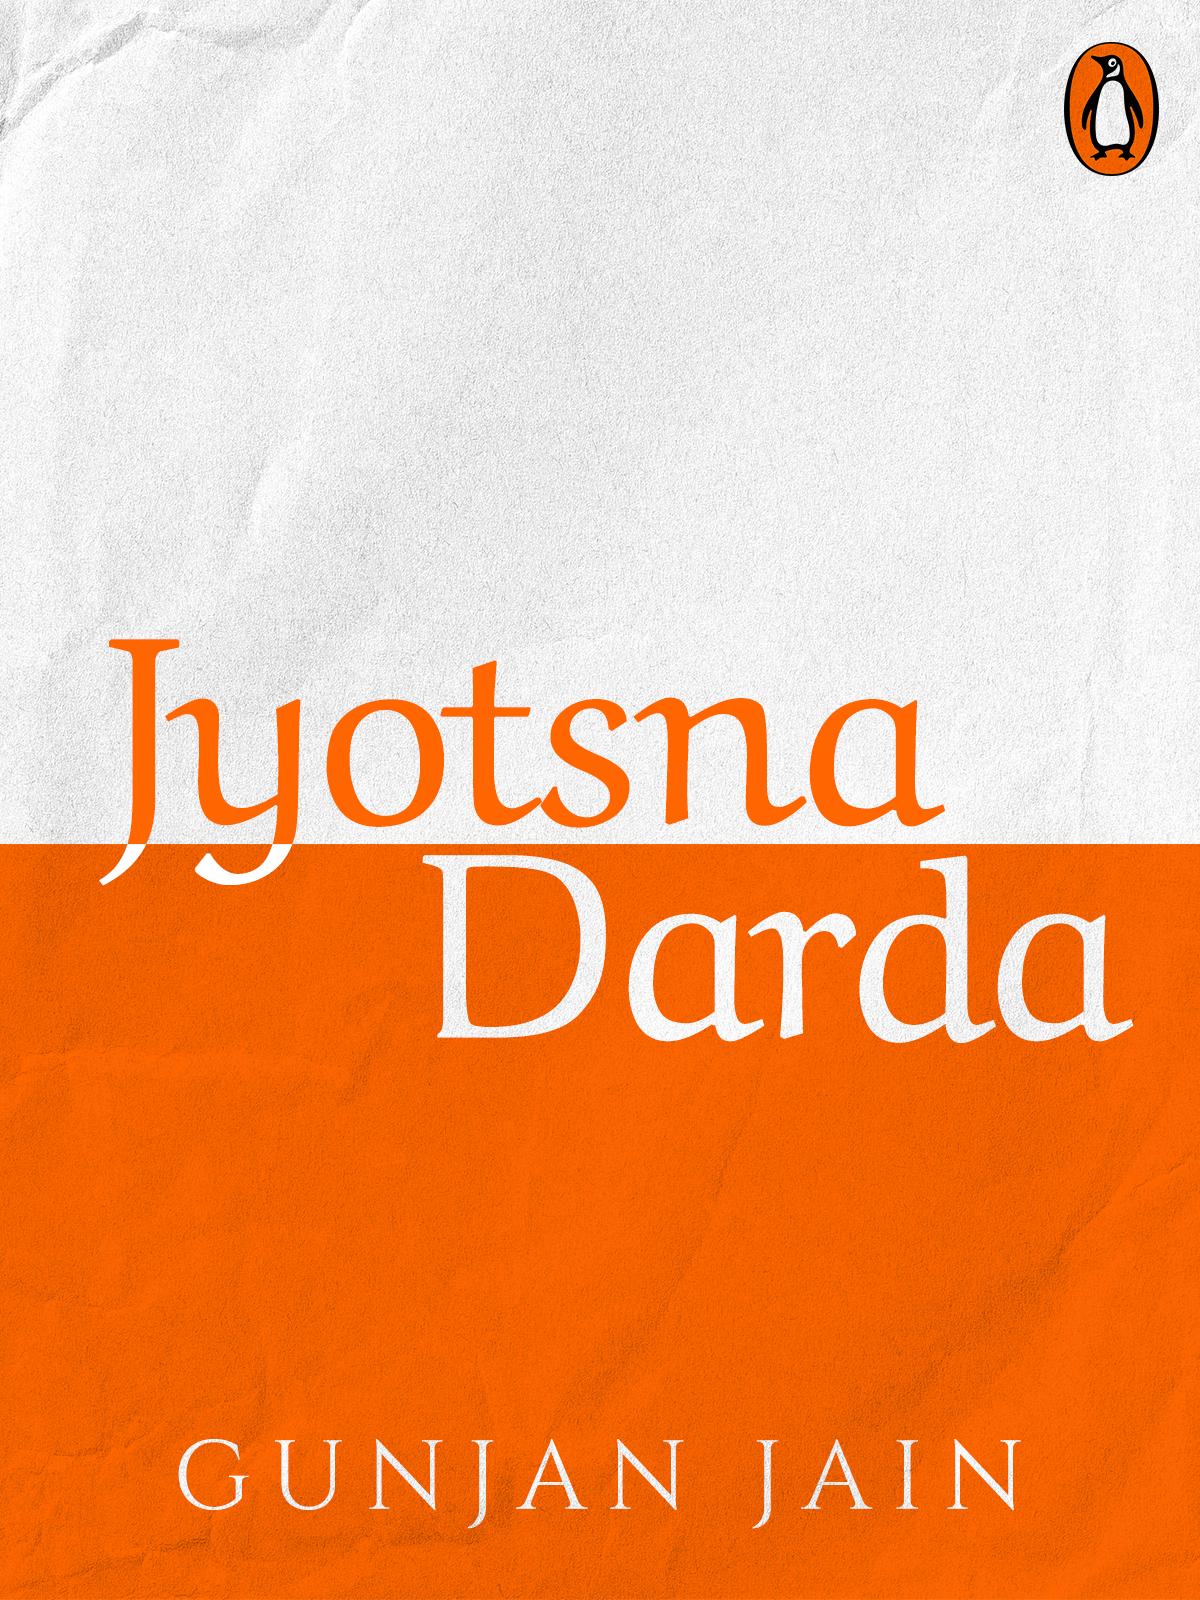 Jyotsna Darda